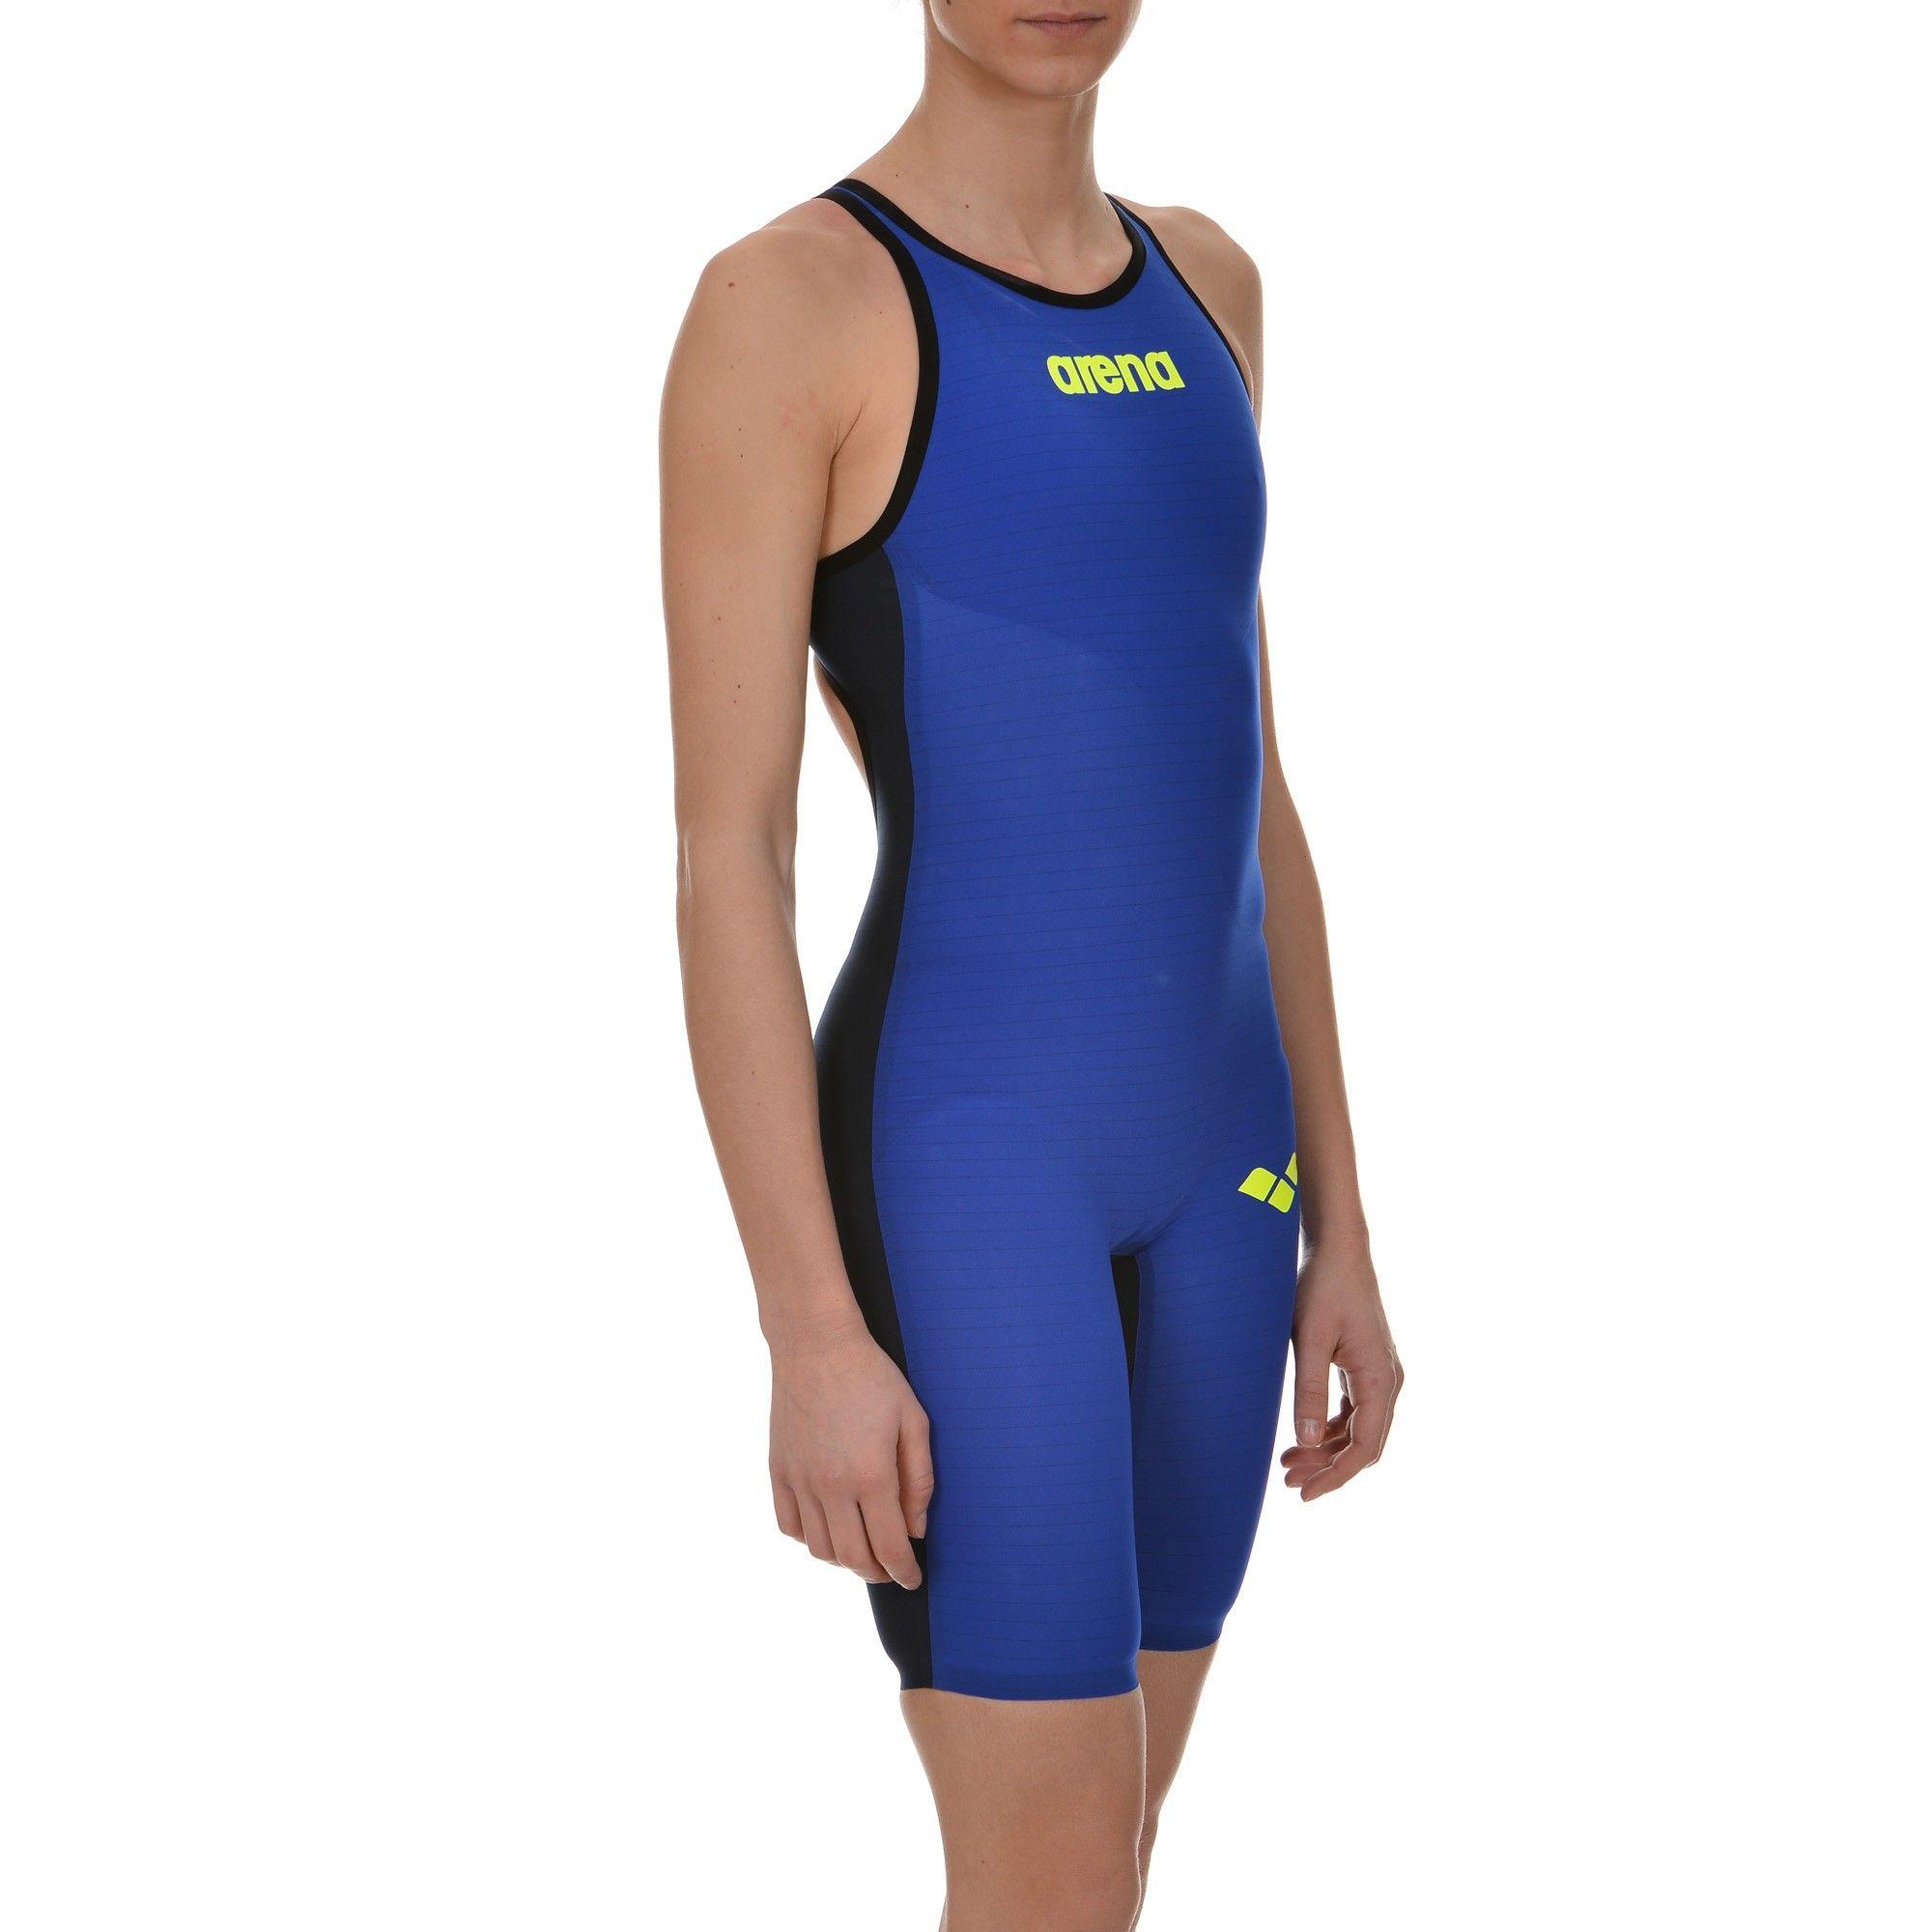 costume nuoto nike donna